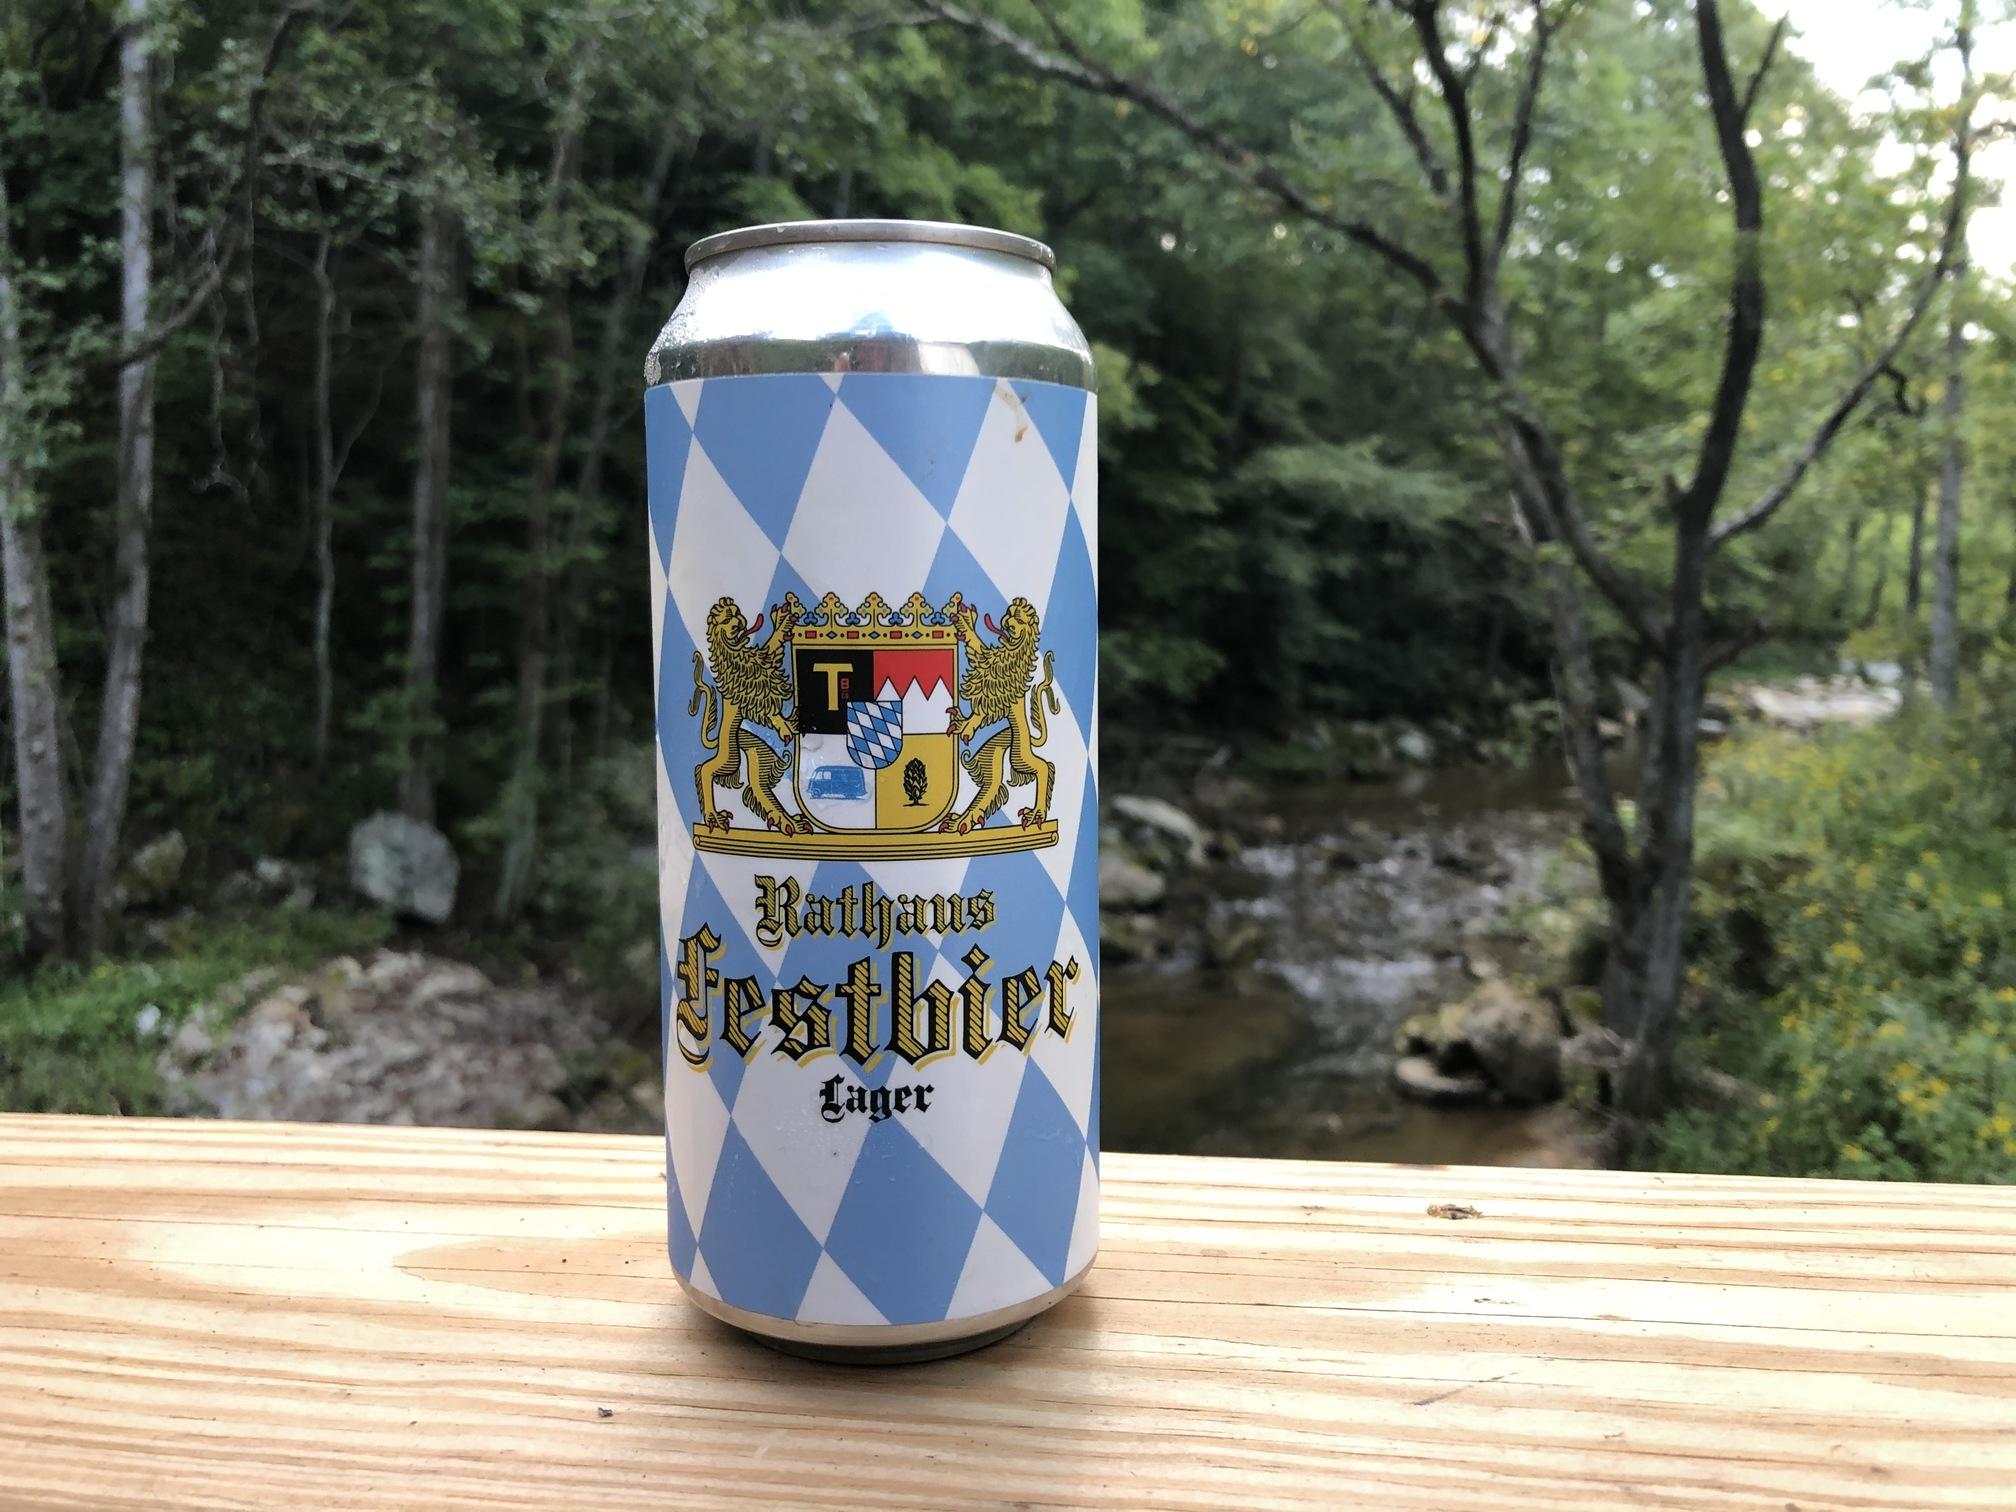 Town Brewing Festbier